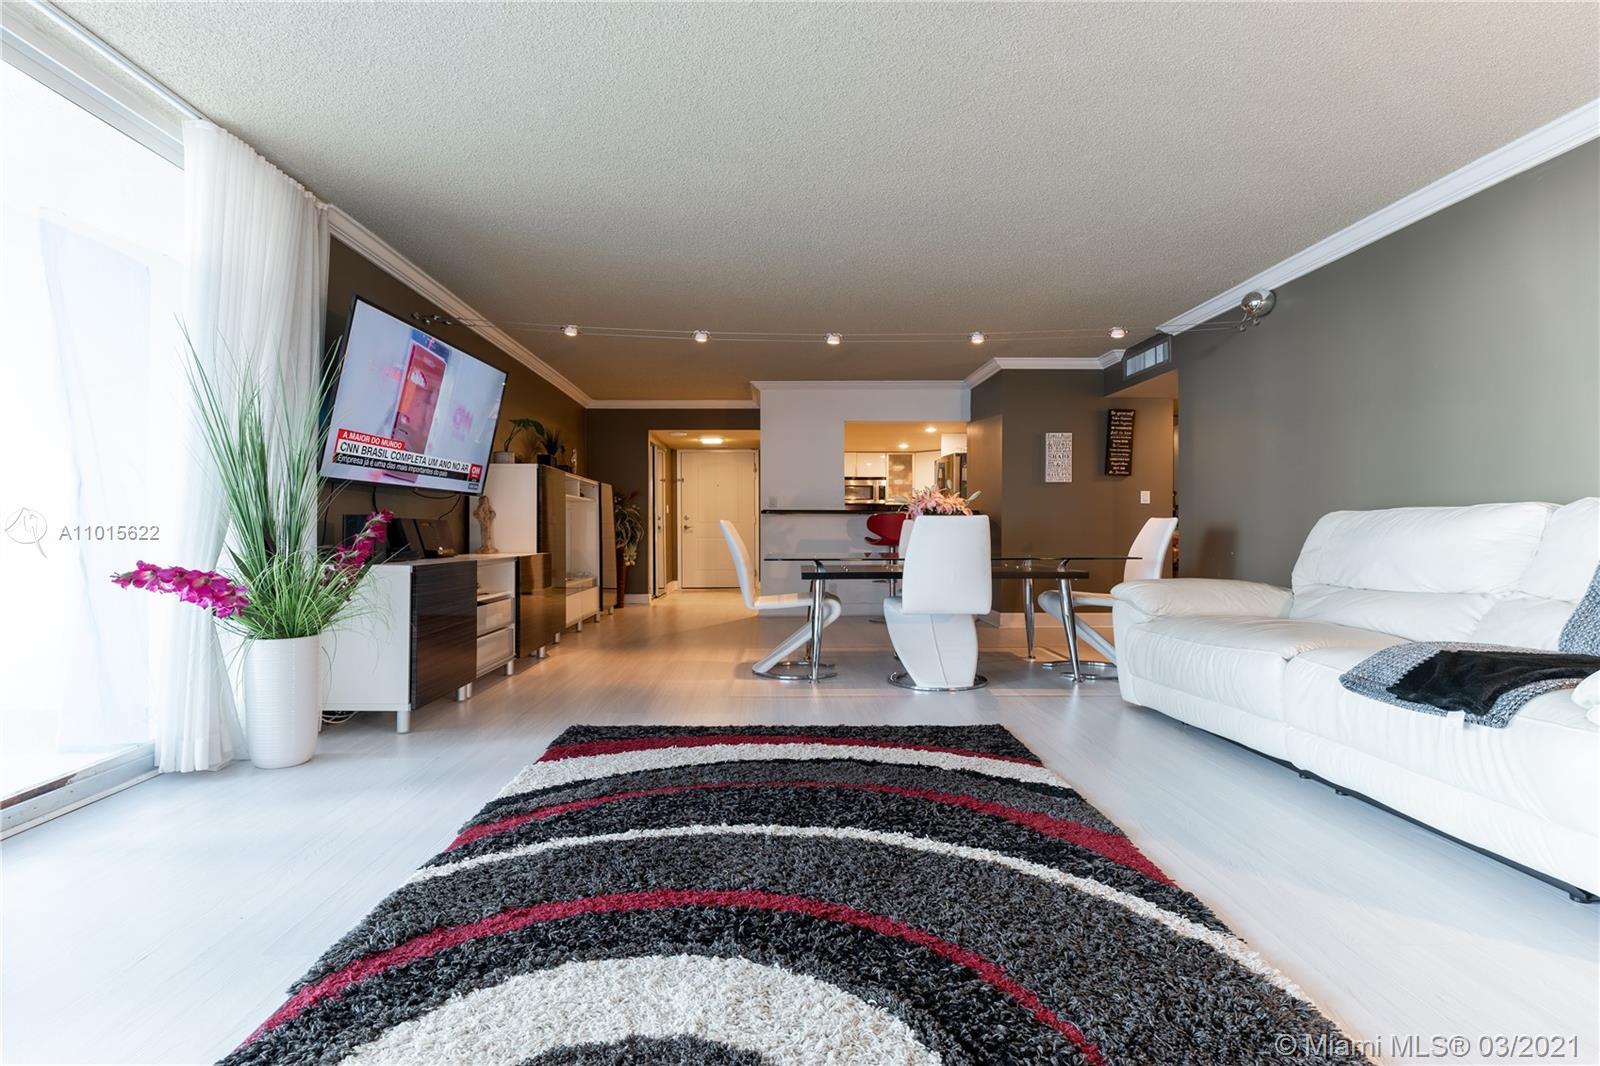 Arlen House #505 - 100 Bayview Dr #505, Sunny Isles Beach, FL 33160